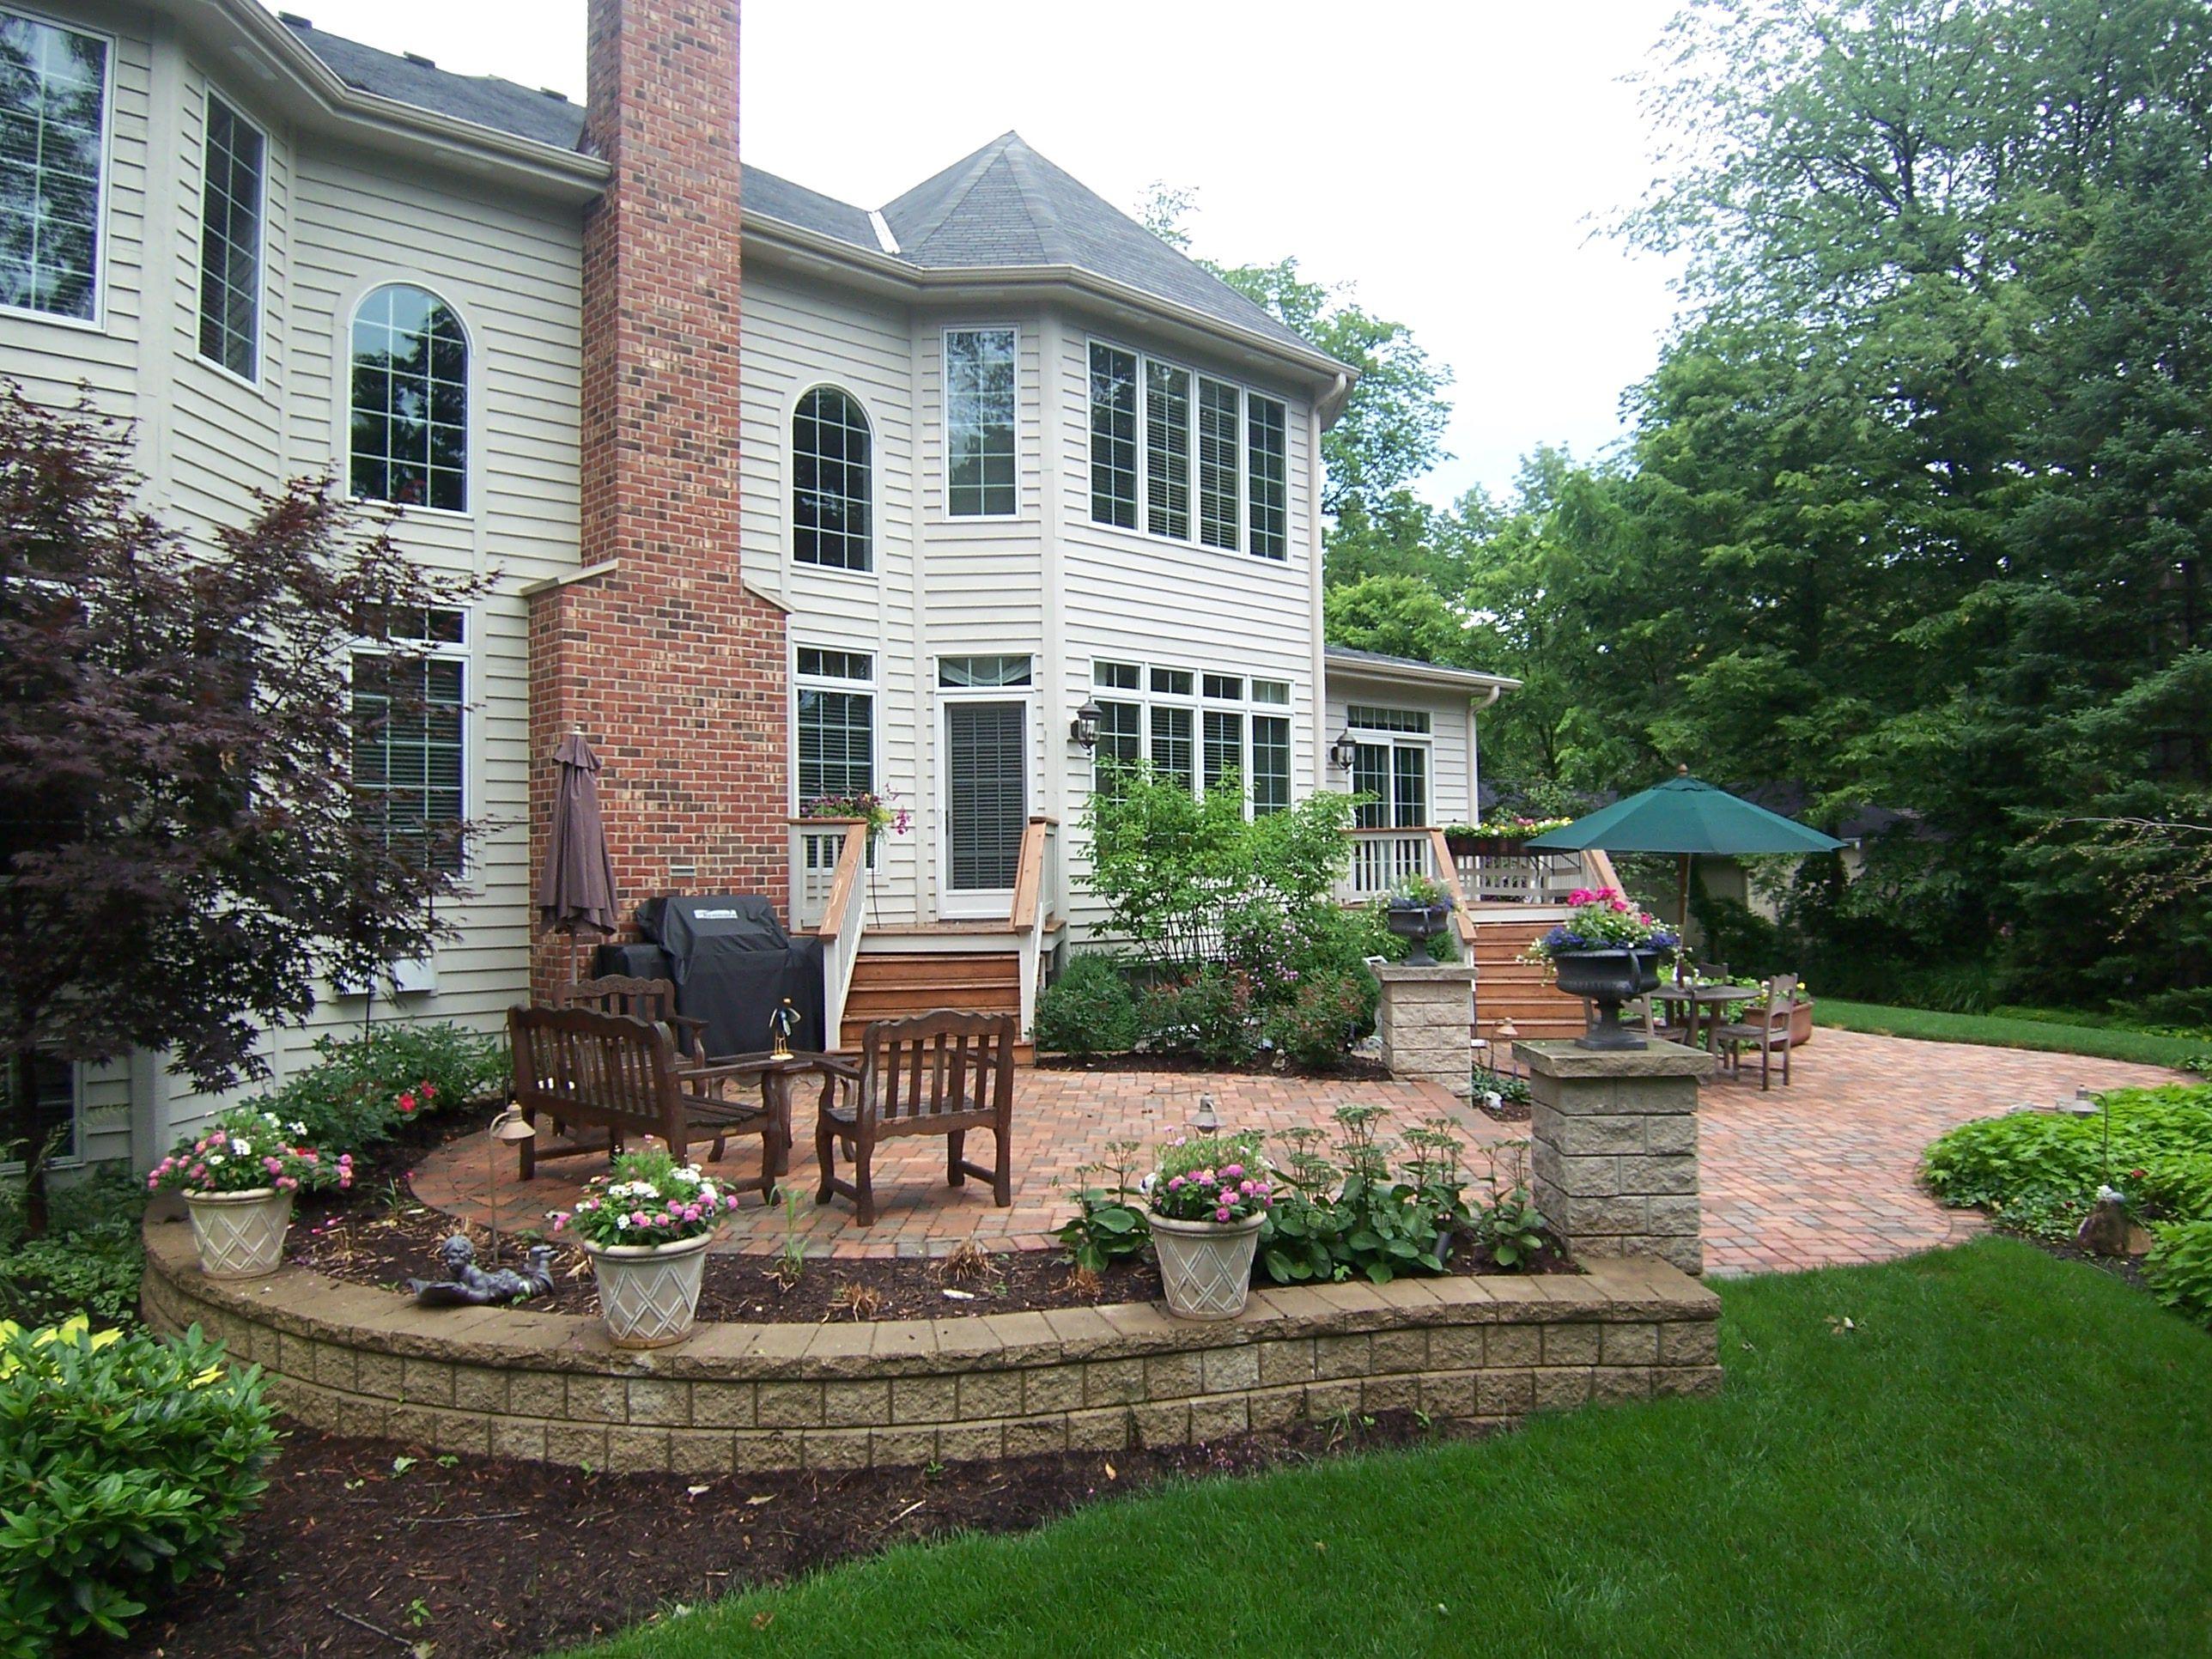 Patio Pavers | Paving Stones | Custom Patio Design D M ... on D&M Outdoor Living Spaces id=23220